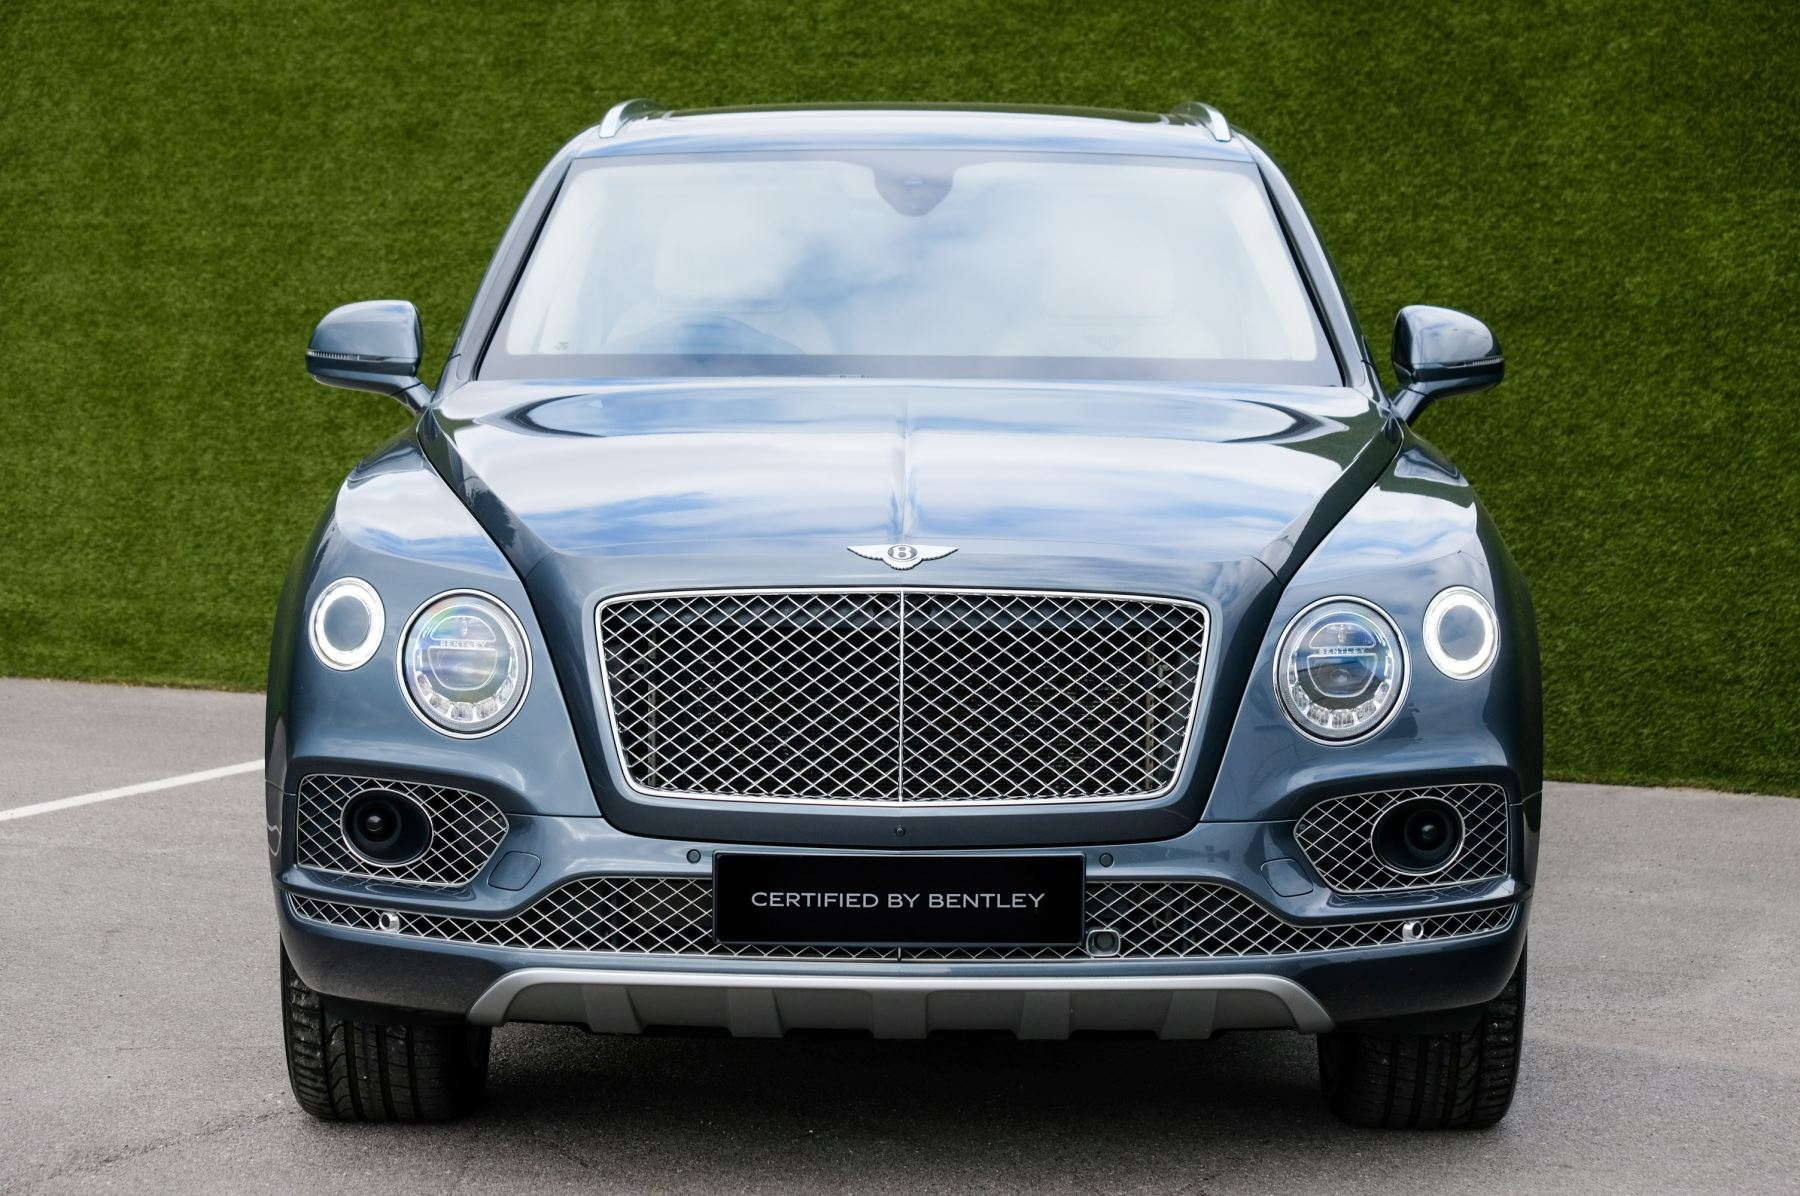 Bentley Bentayga 4.0 V8 5dr - Mulliner Driving Specification - City & Tour Specification image 2